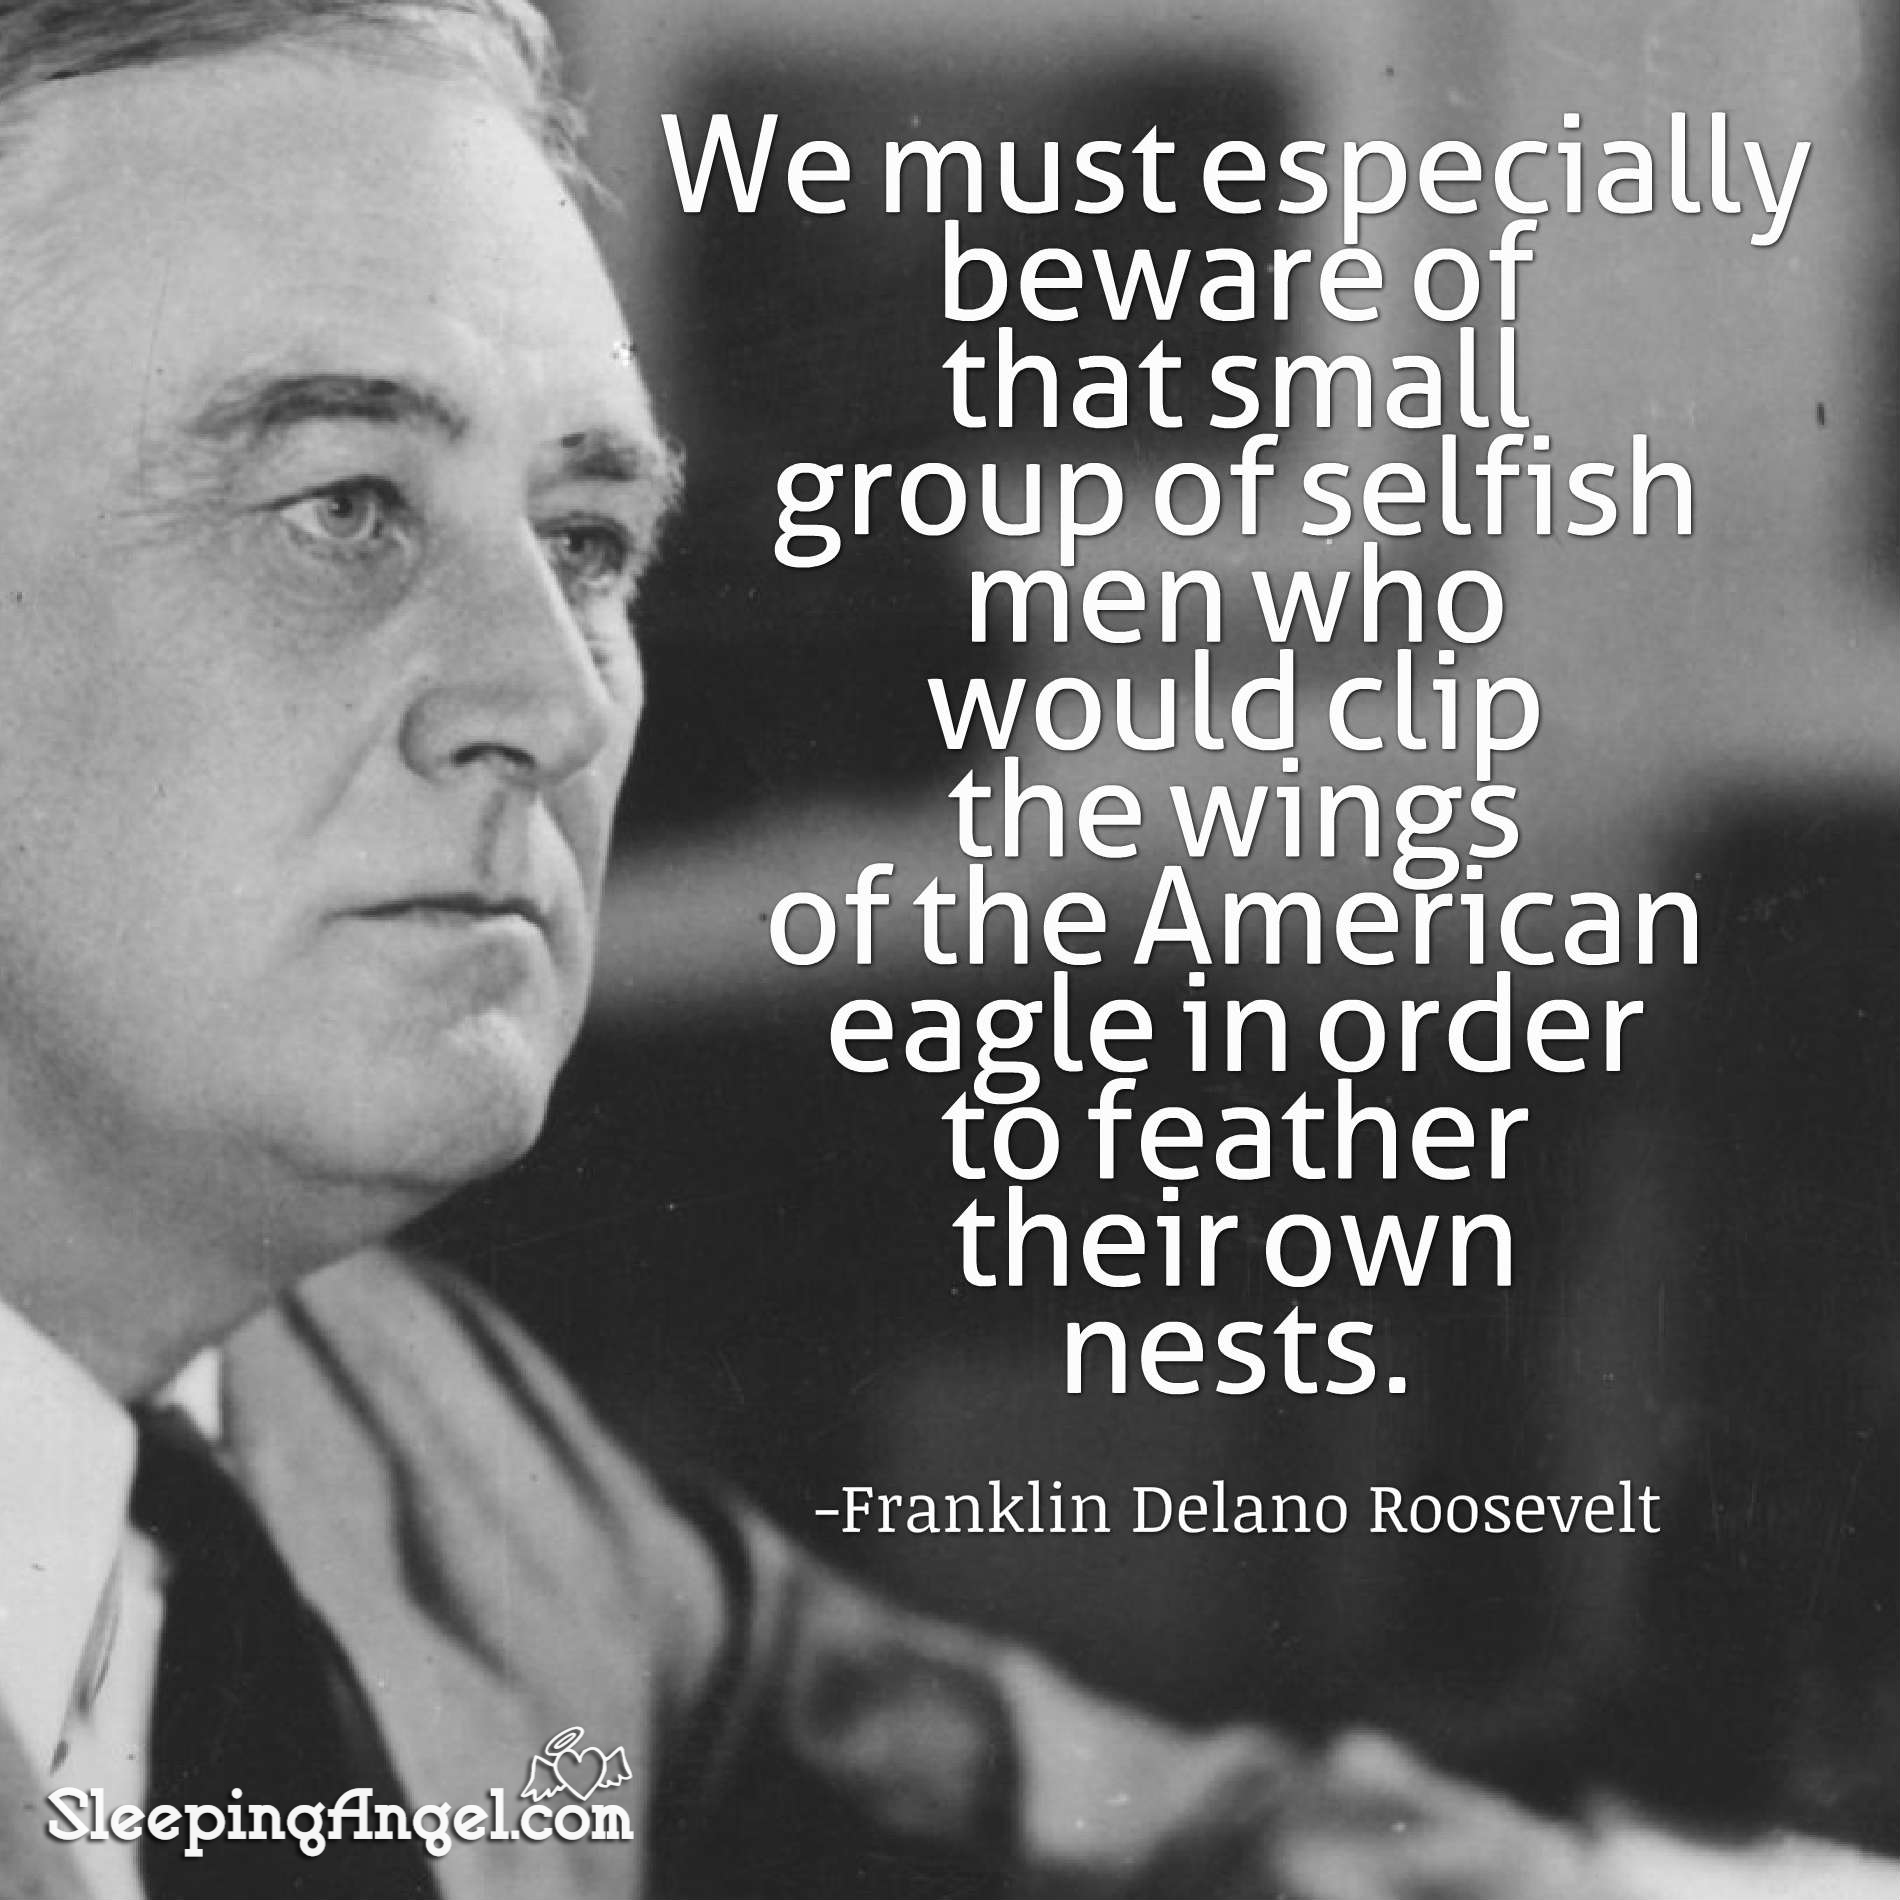 Franklin Delano Roosevelt Quote